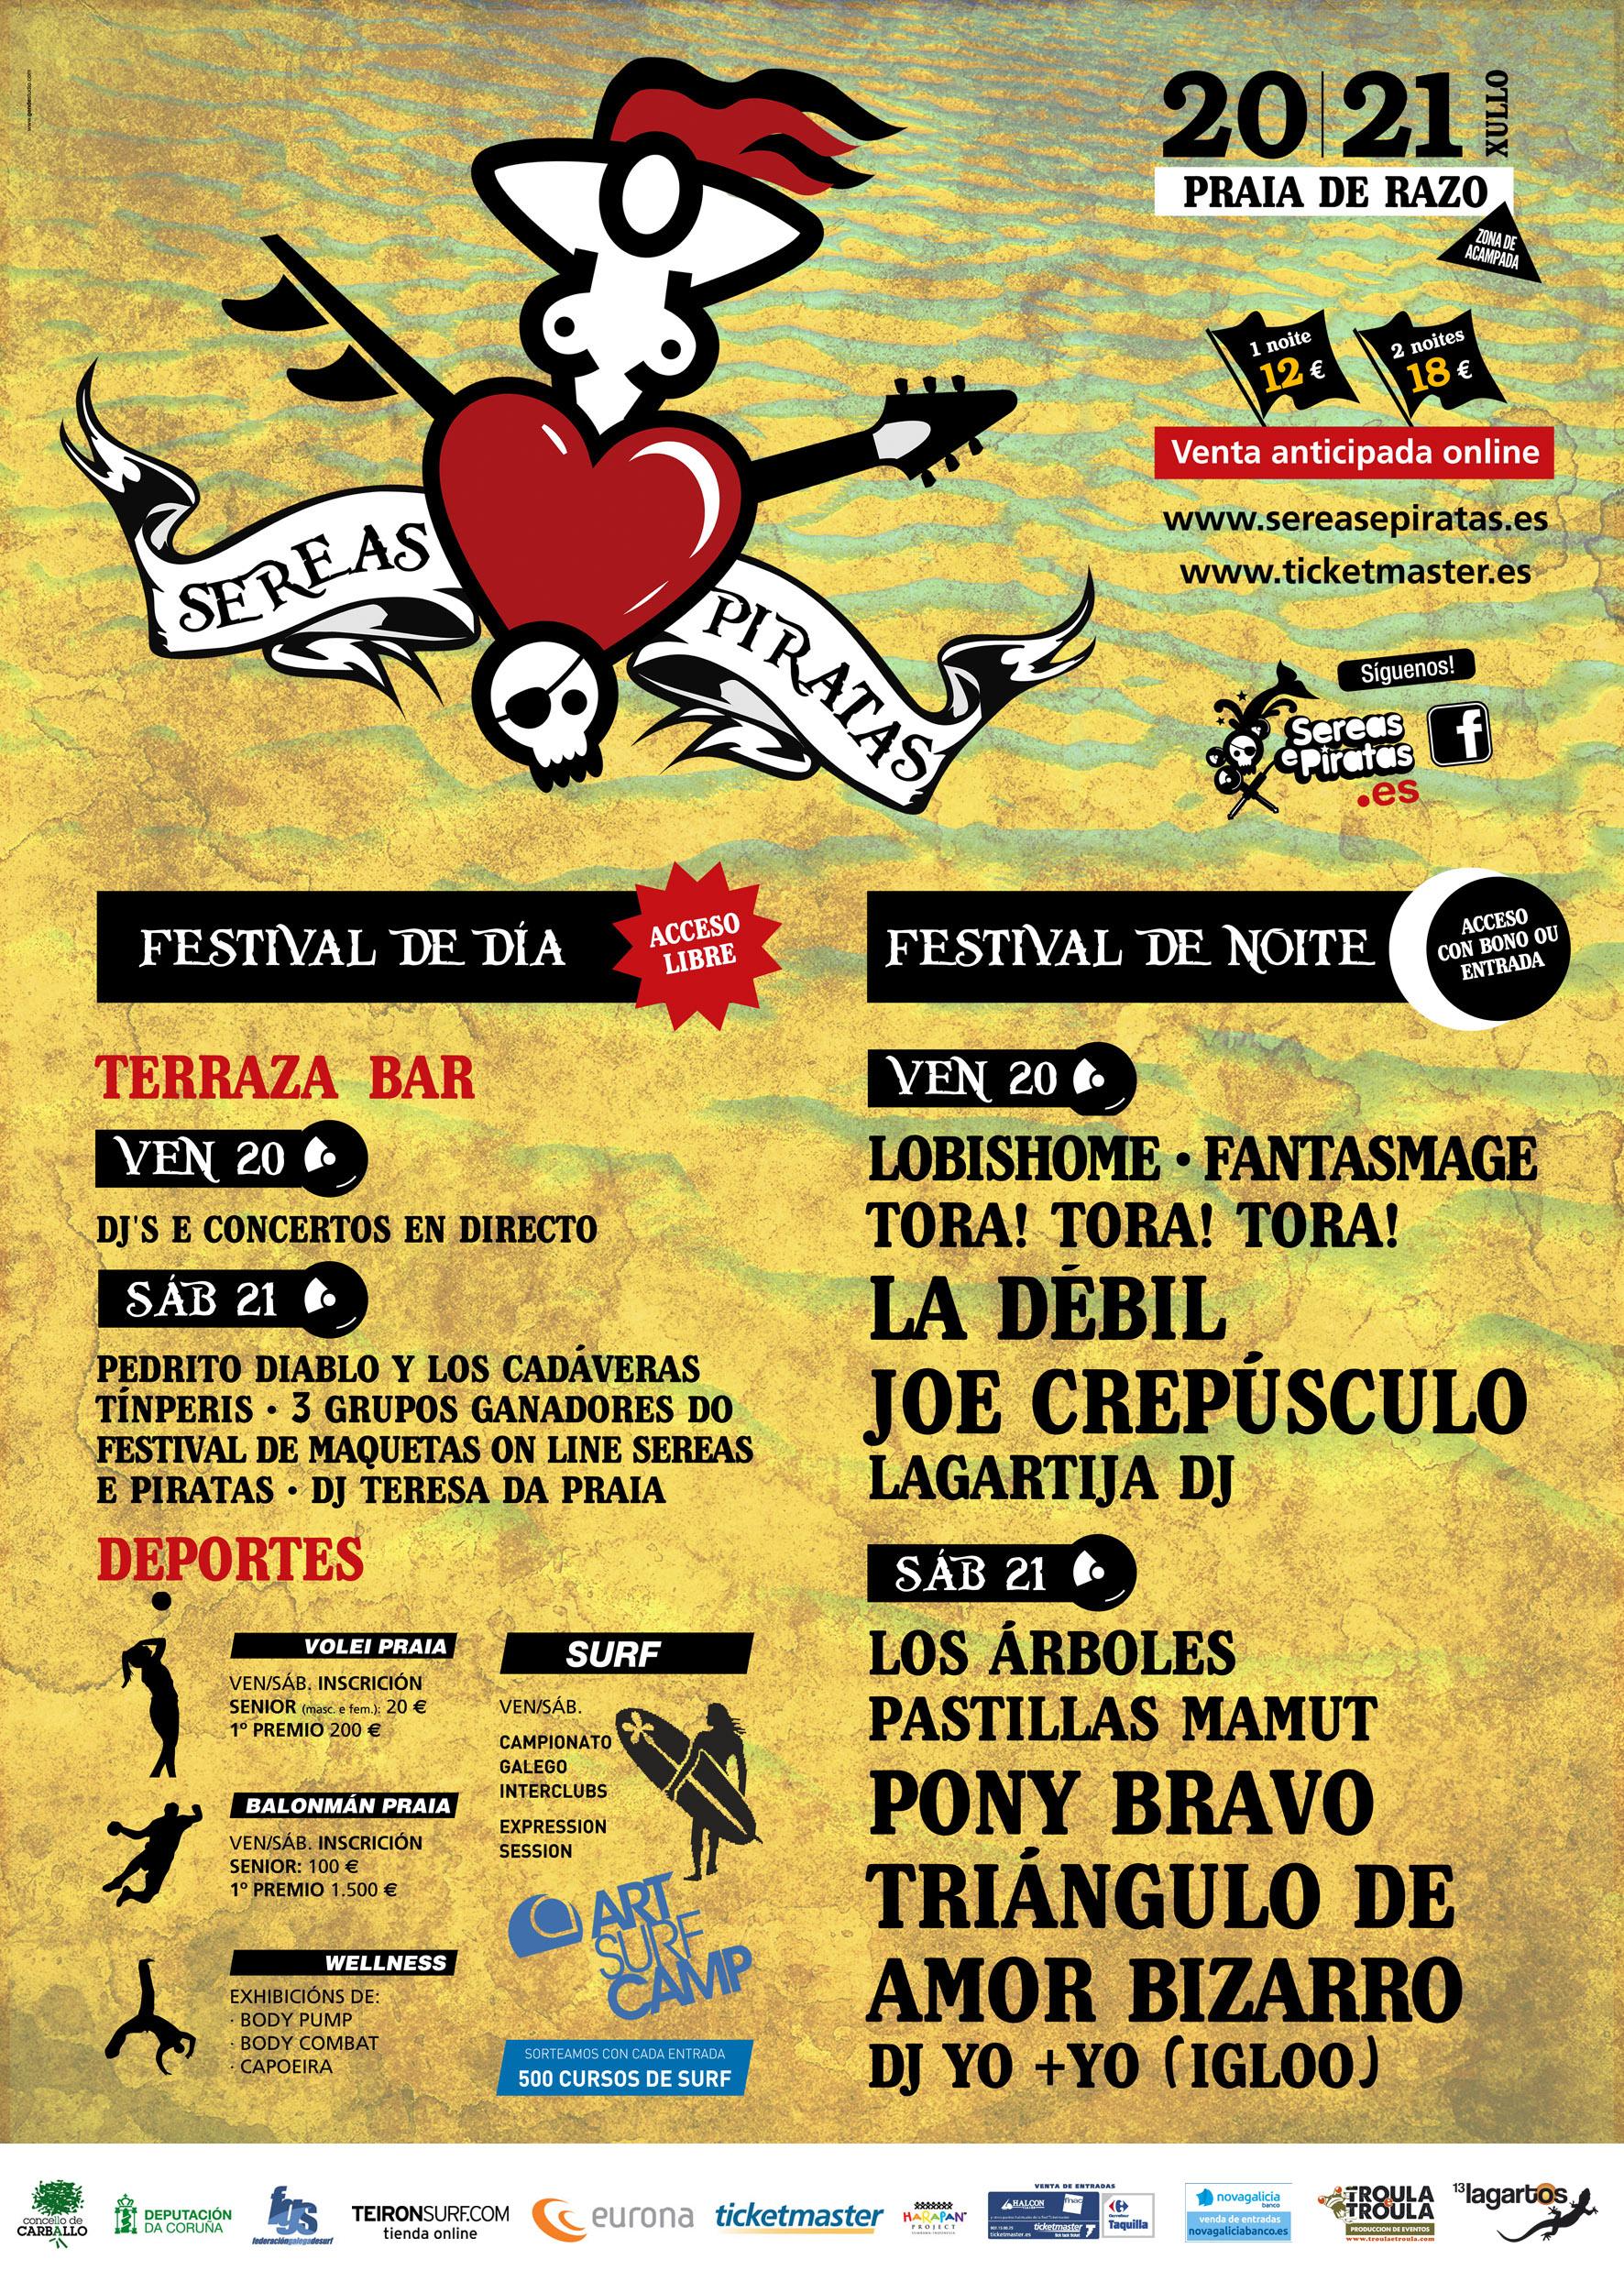 Sereas e Piratas 2012